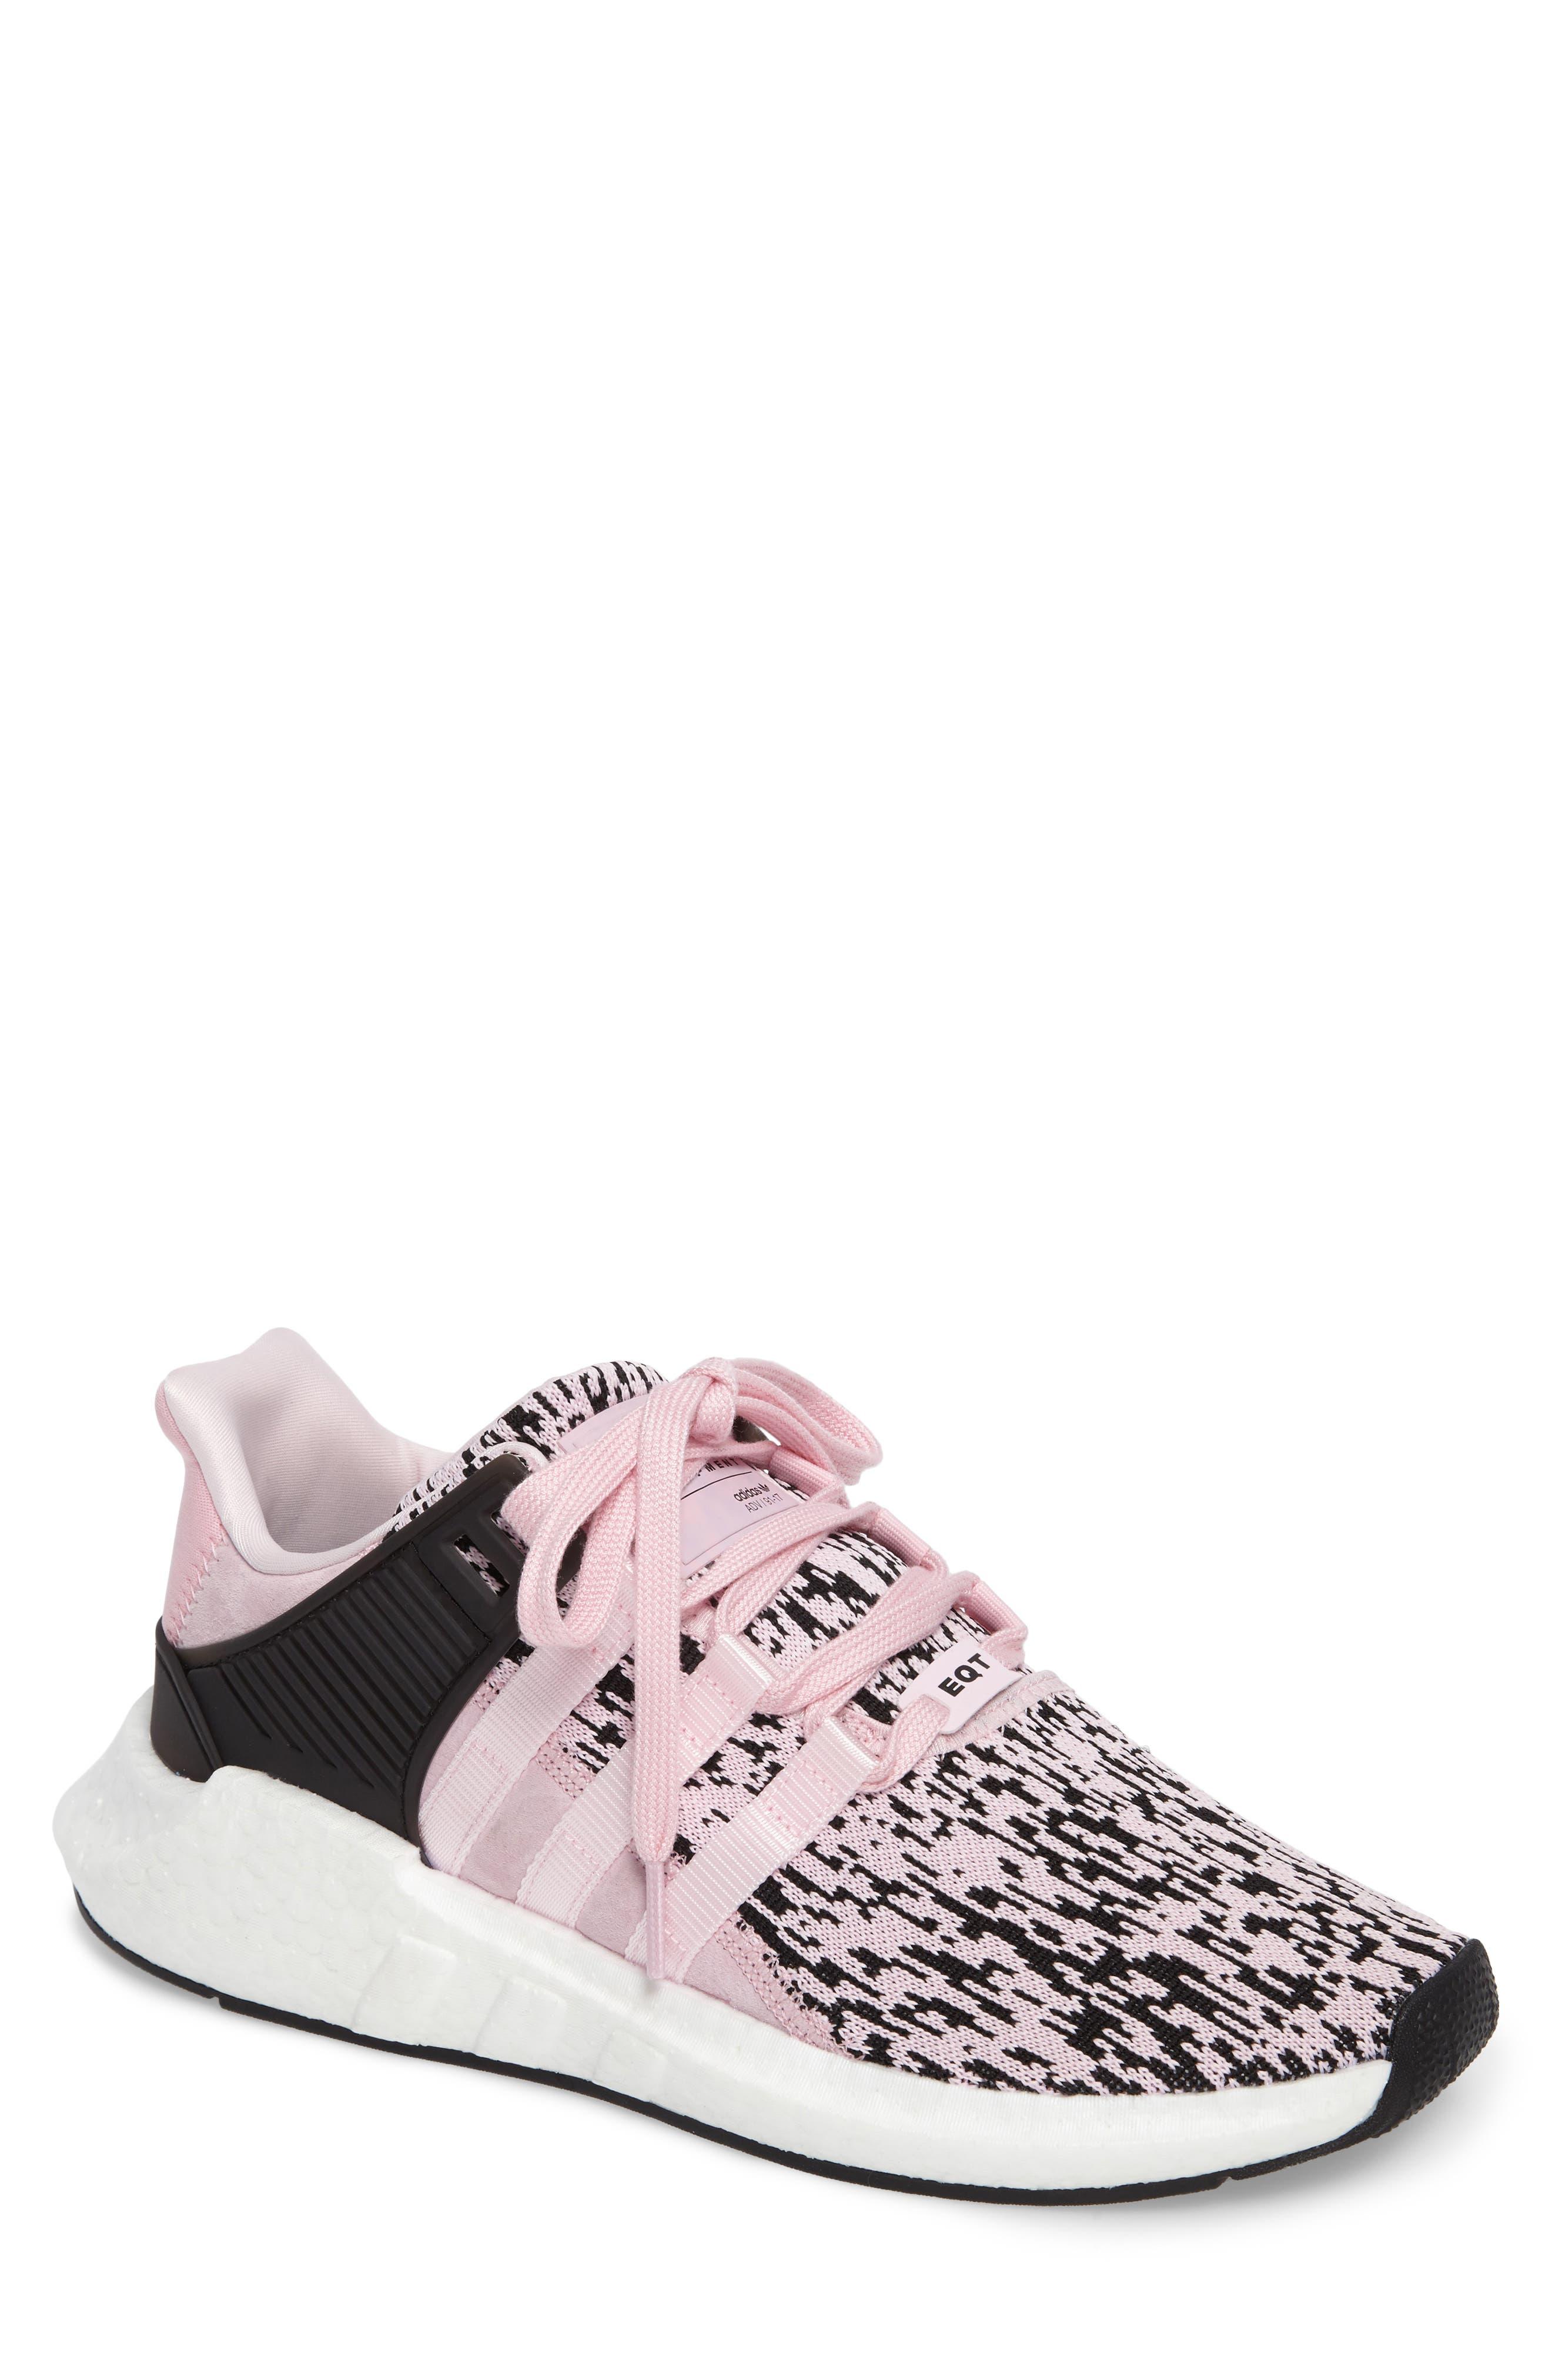 Alternate Image 1 Selected - adidas EQT Support 93/17 Sneaker (Men)